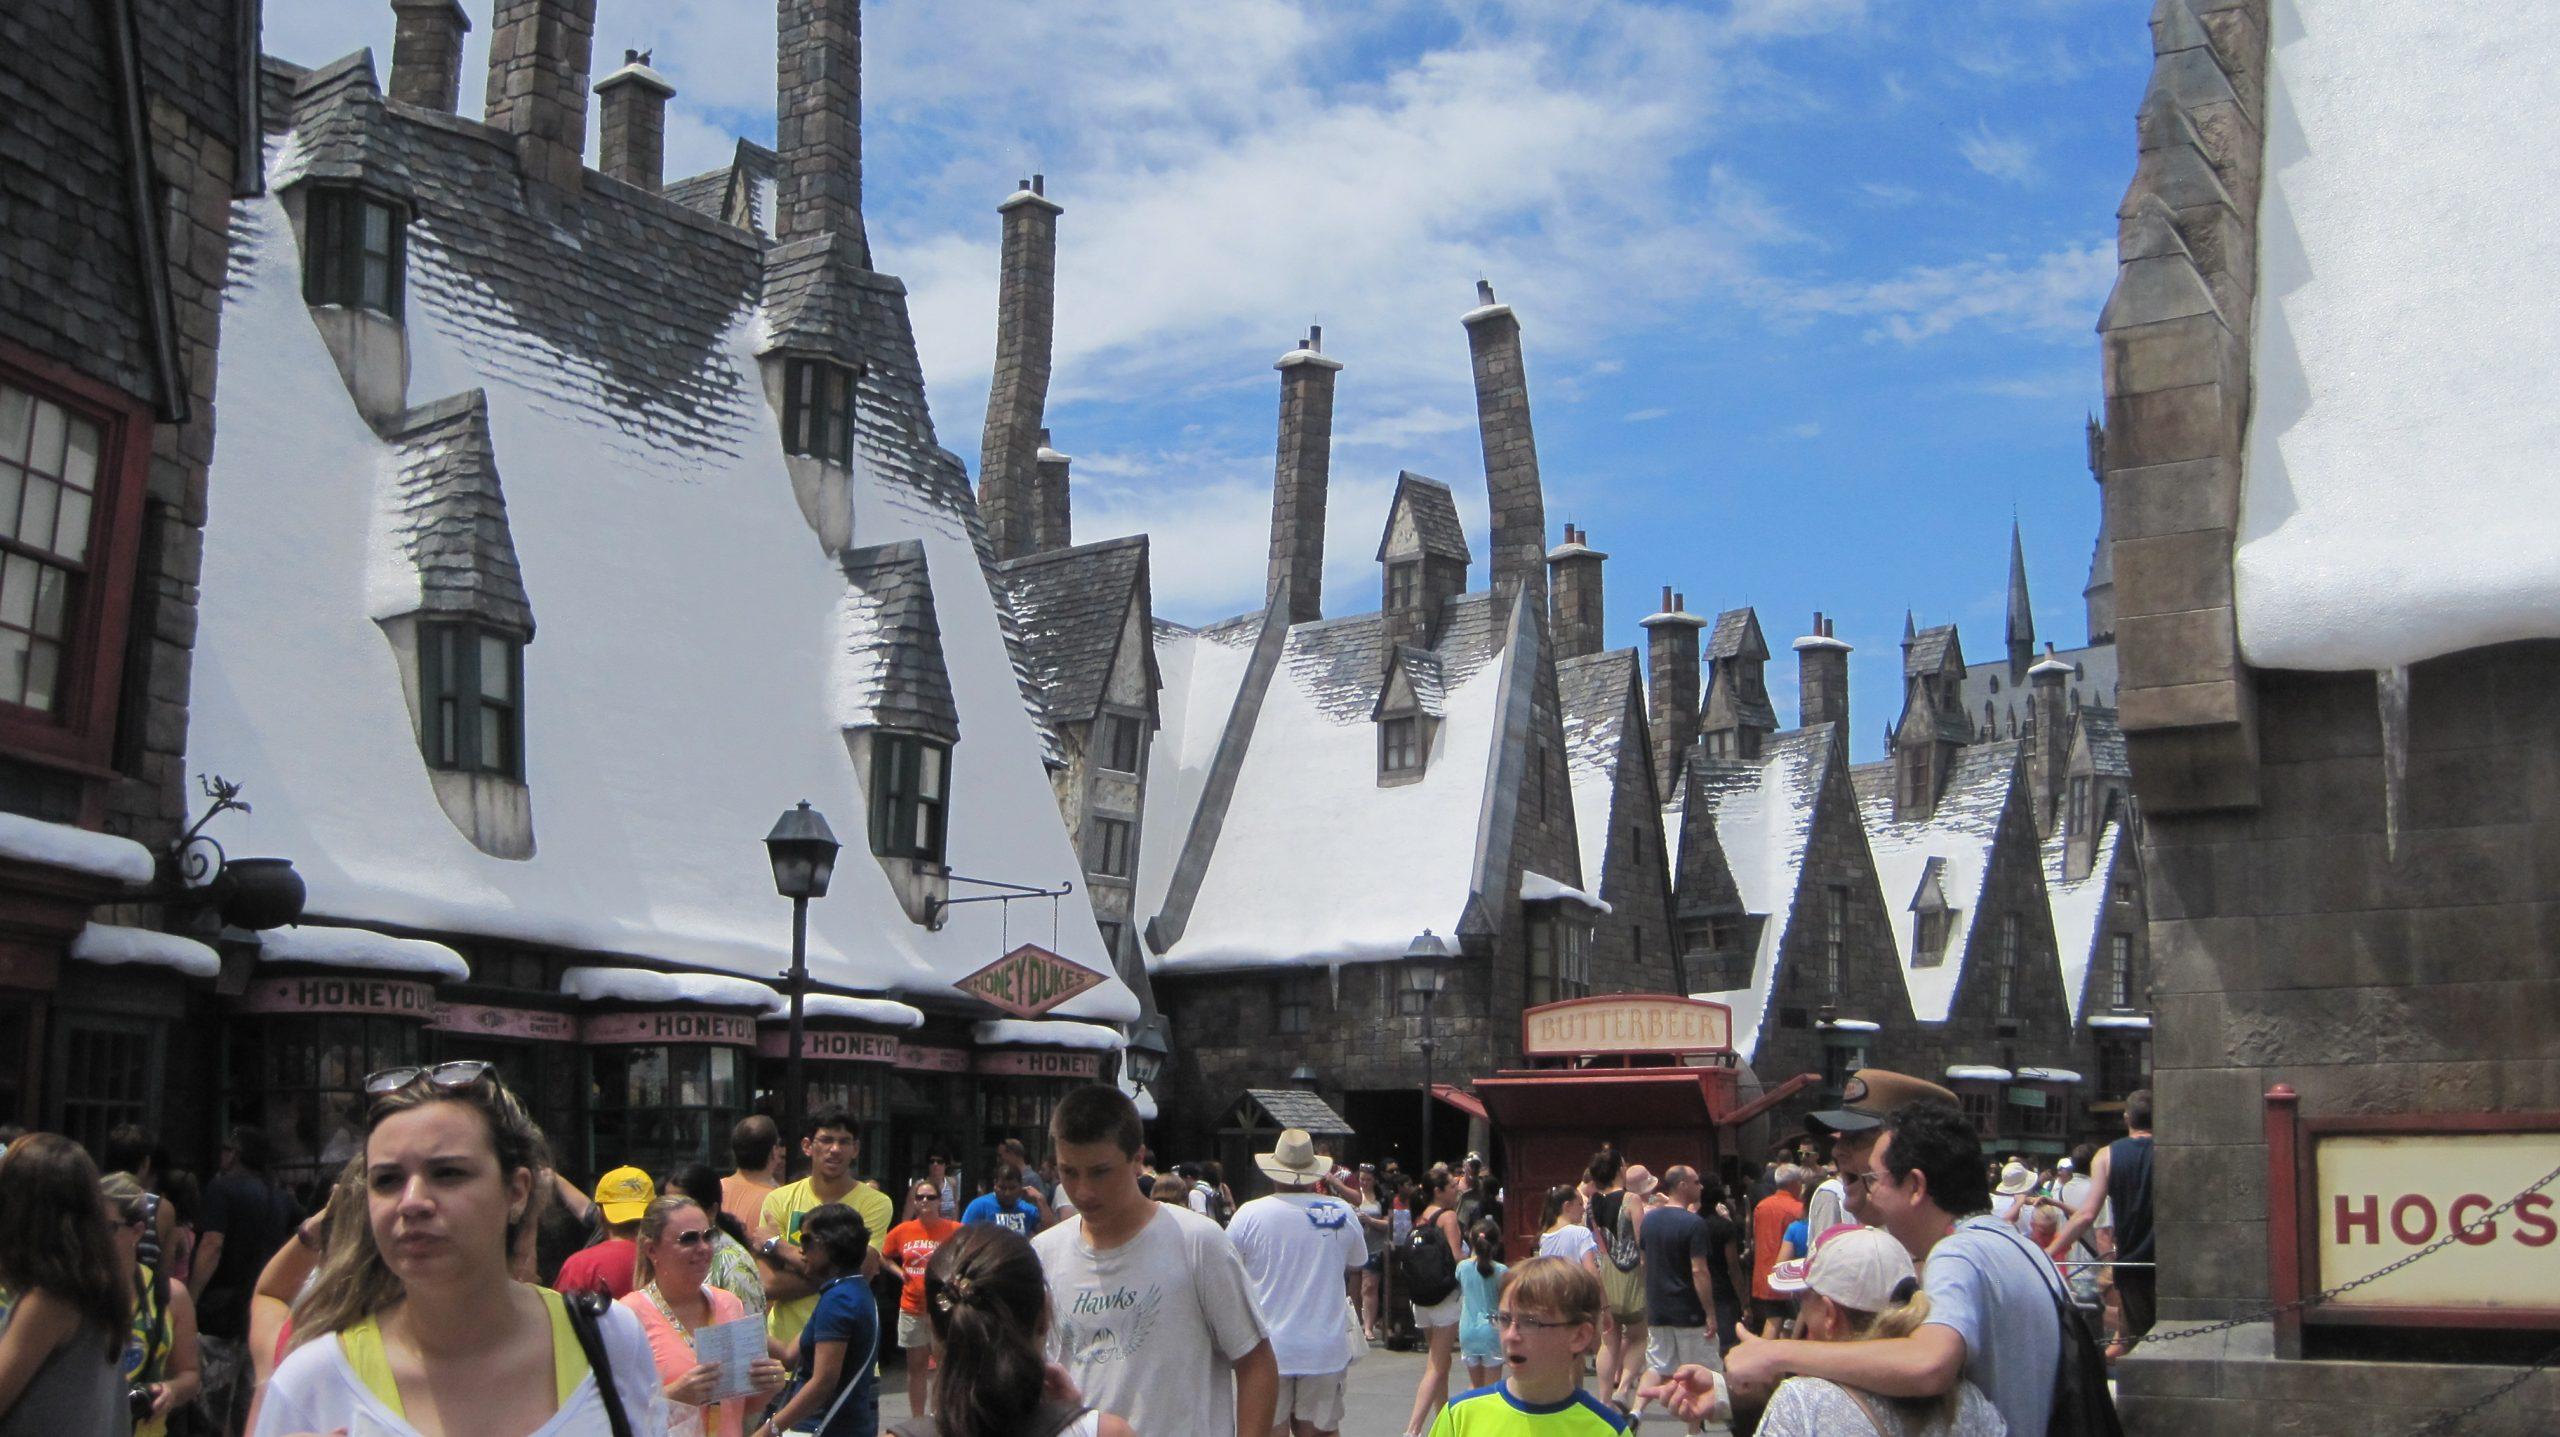 Universal Studios' Harry Potter themed lands - photo by Juliamaud